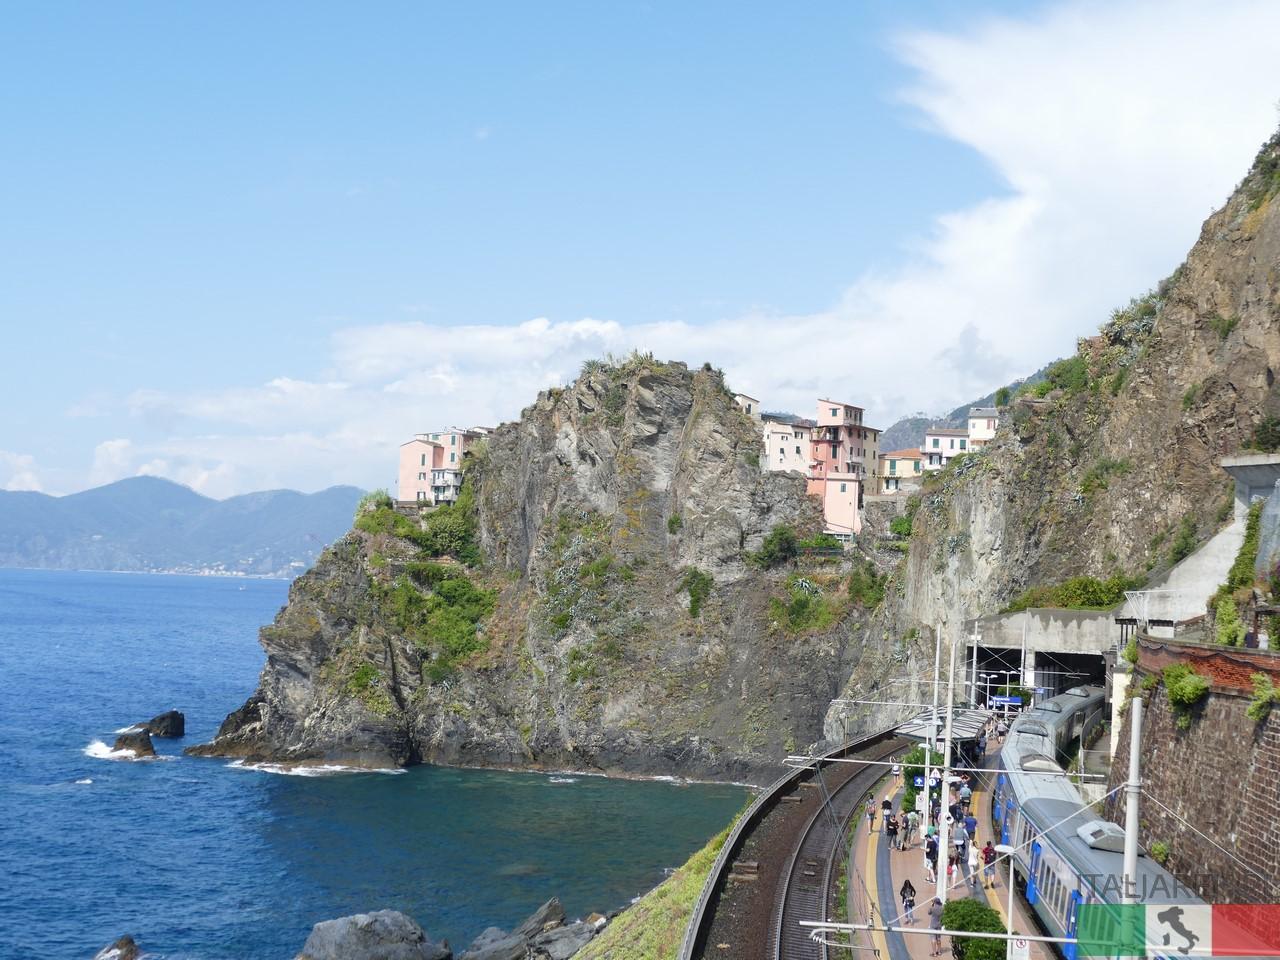 Cinque Terre - podróże pociągiem